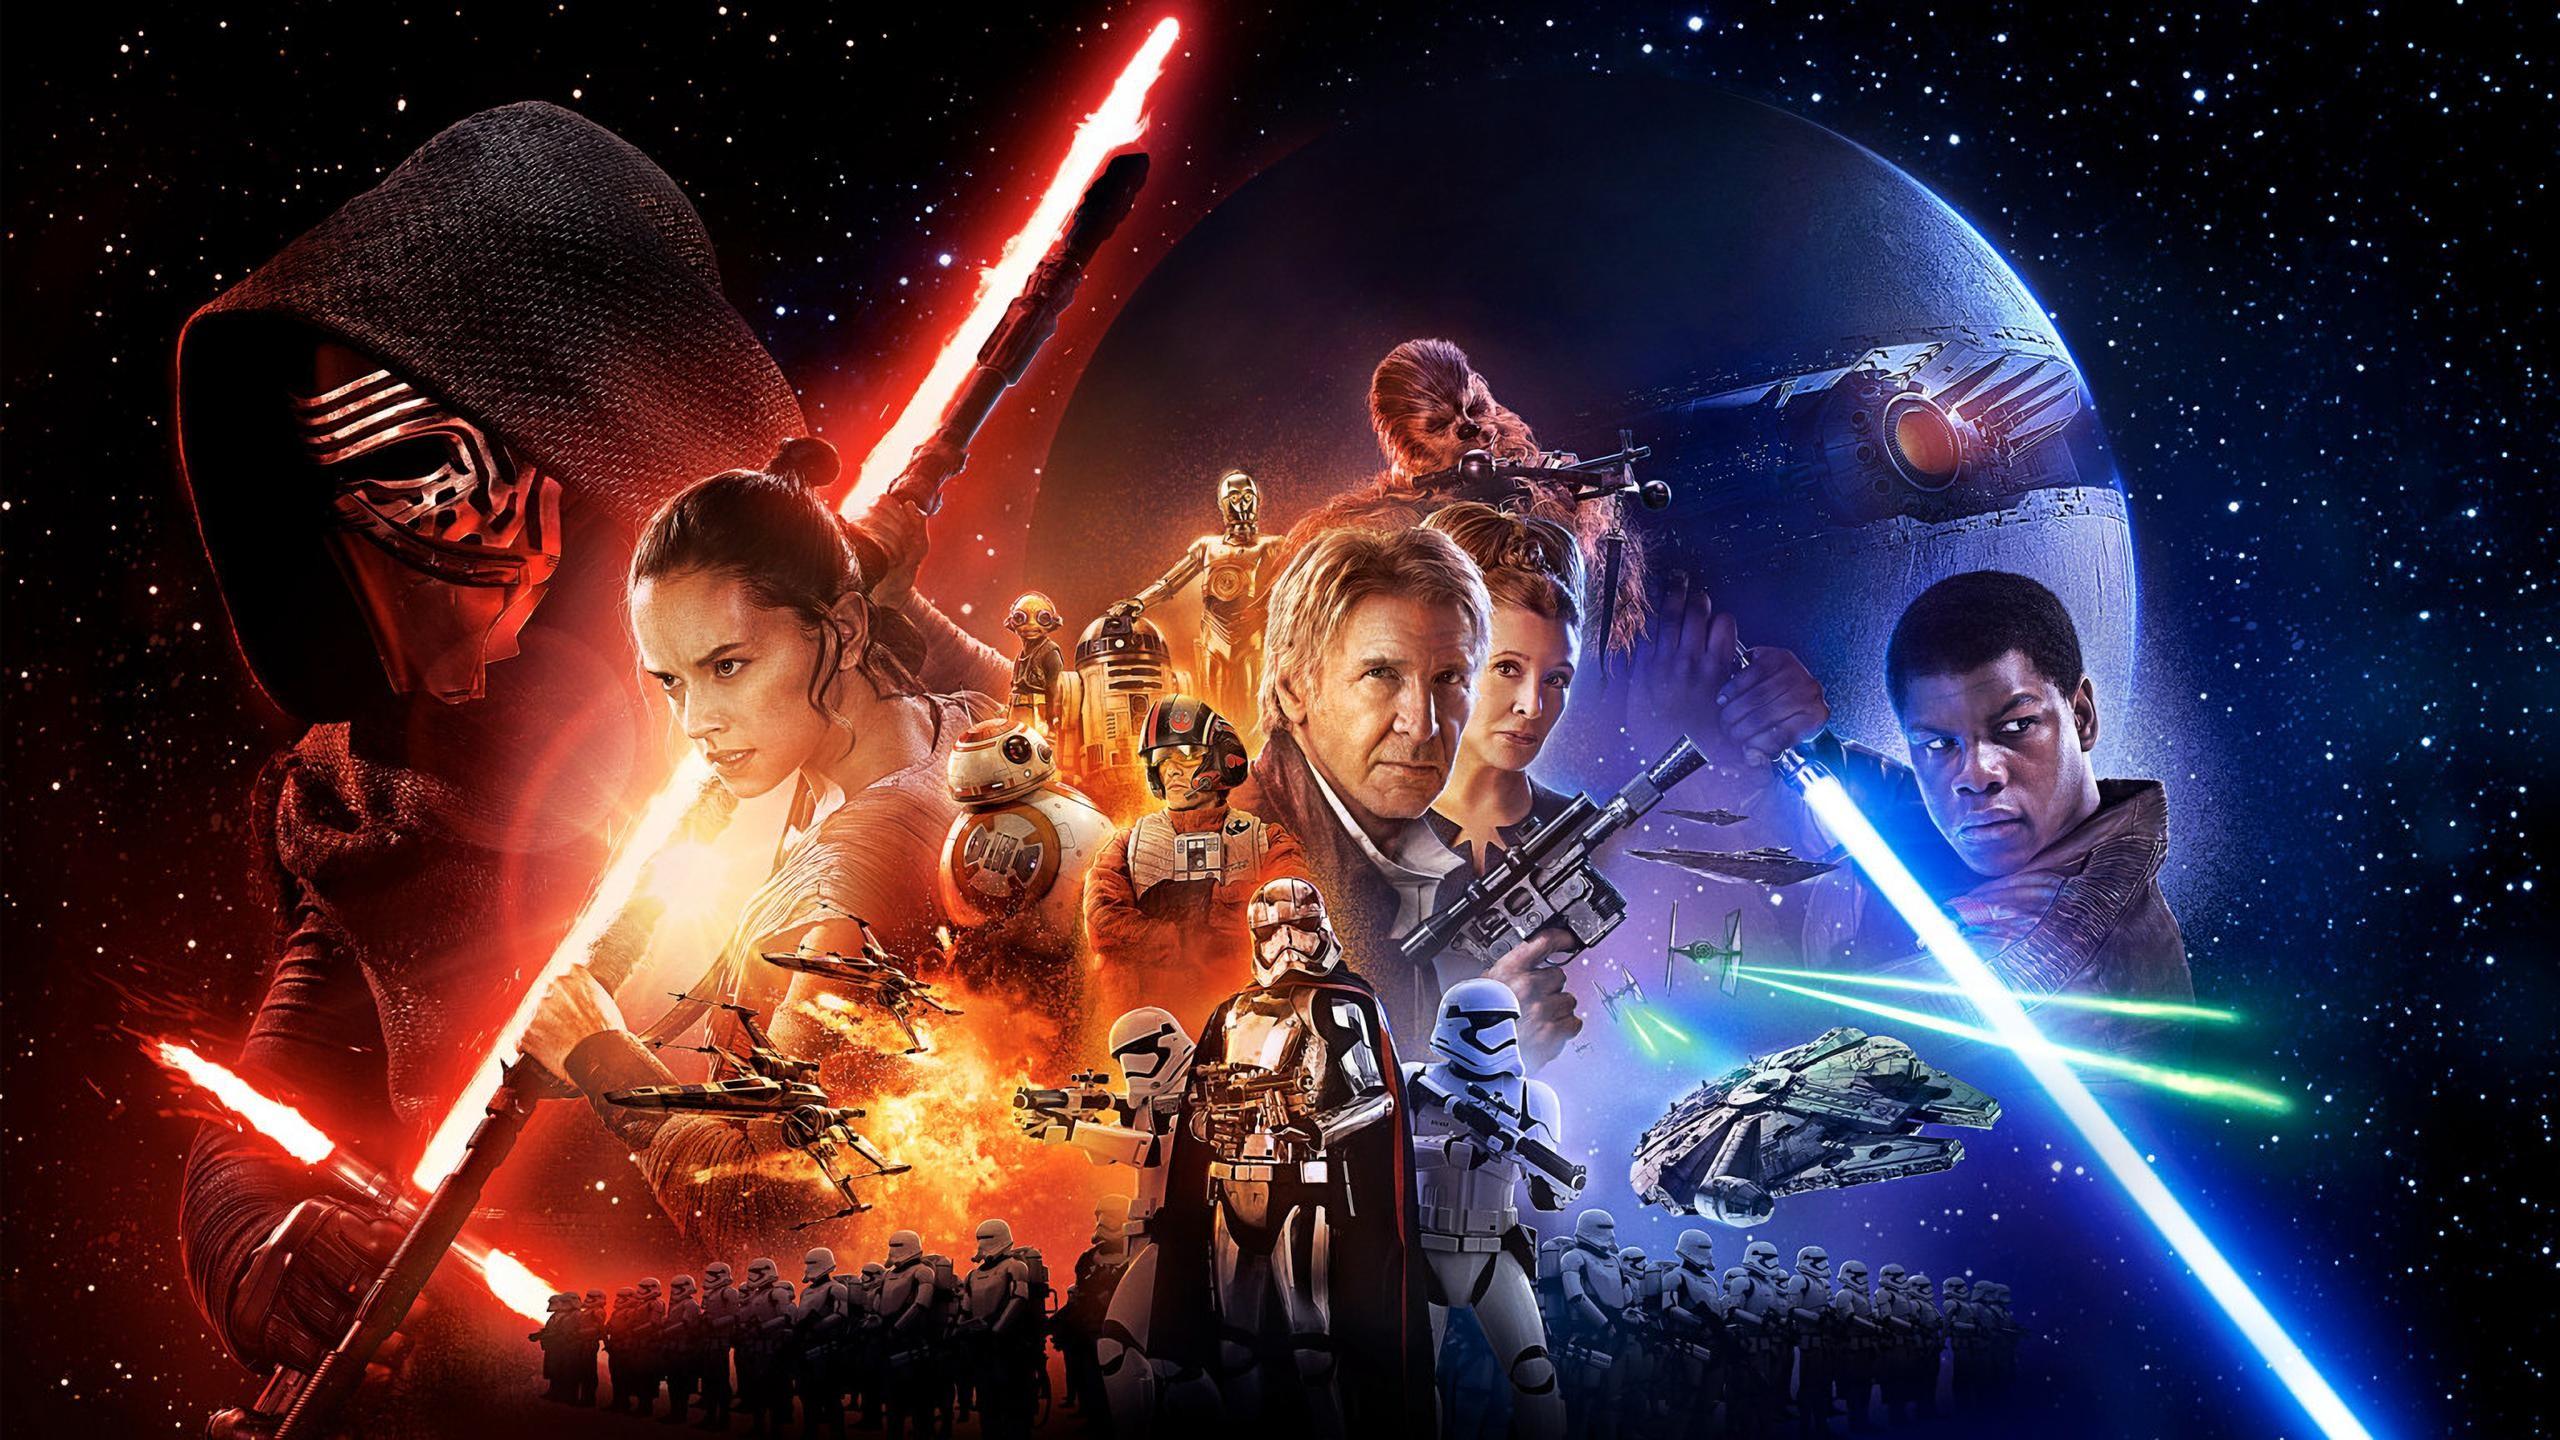 Star Wars Movie Wallpaper Wallpapertag